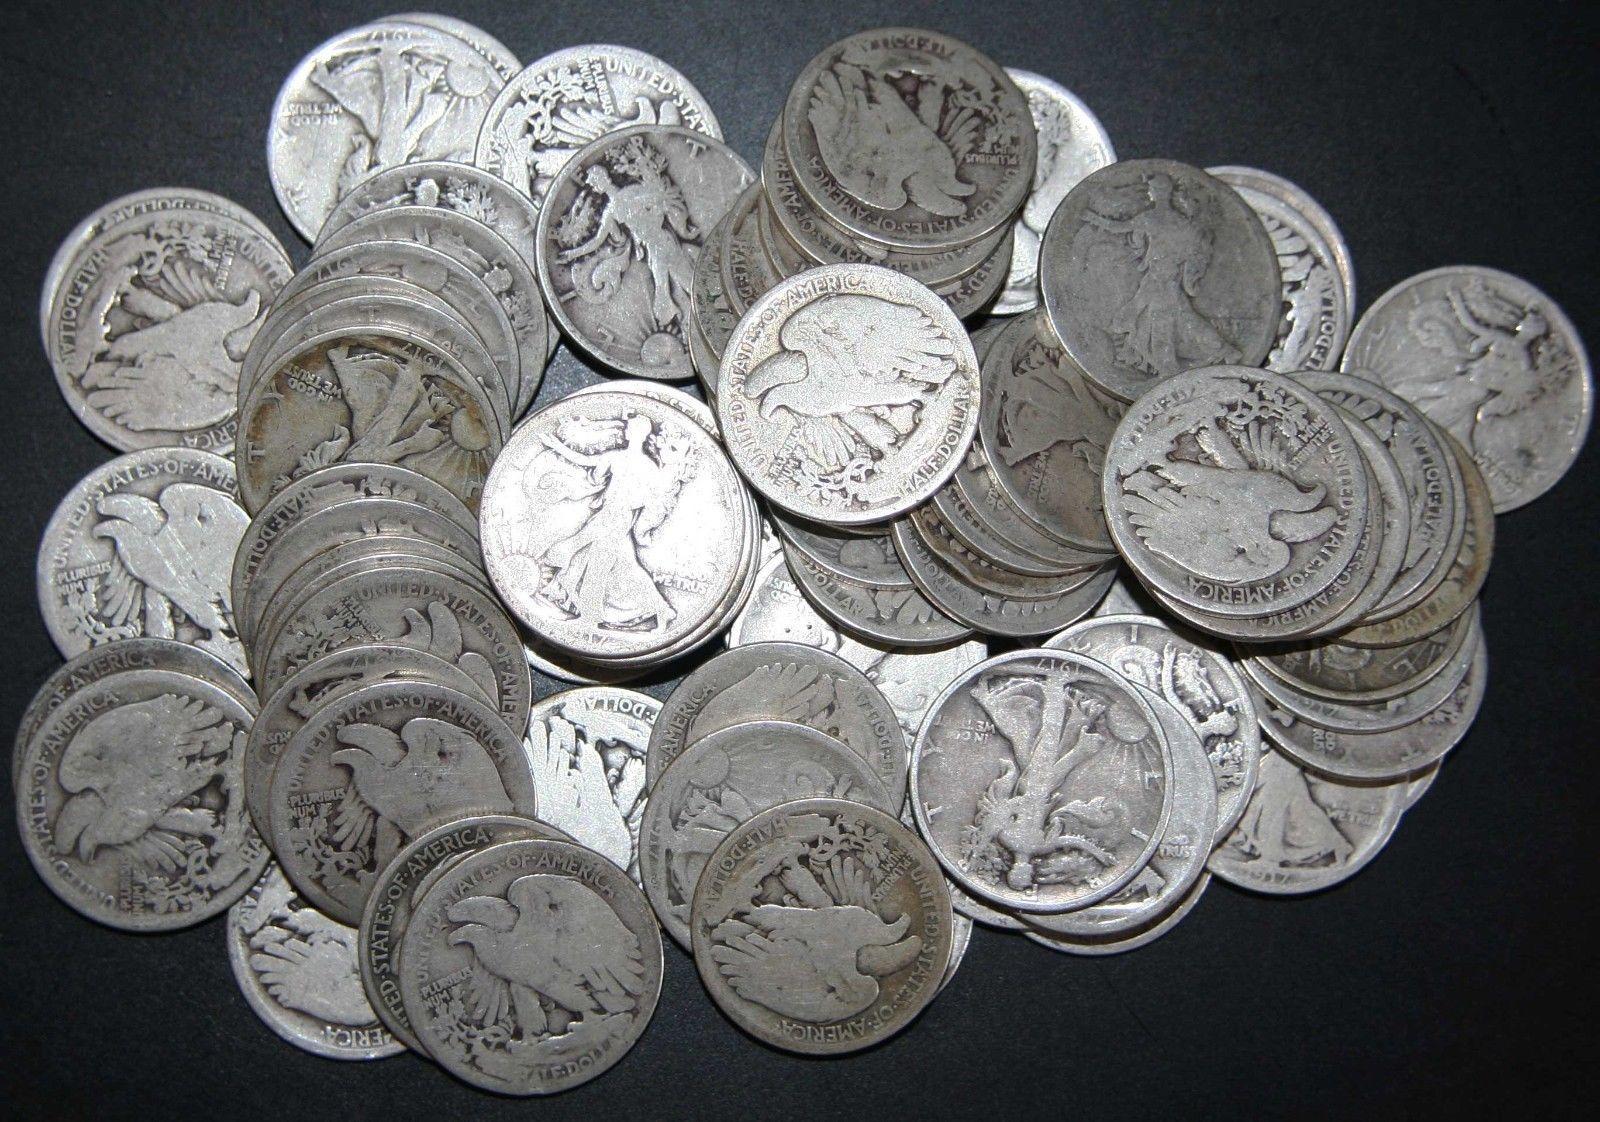 ( 100 COINS ) - ALL 1917 Walking Liberty Half Dollar 90% Silver Lot# N 518